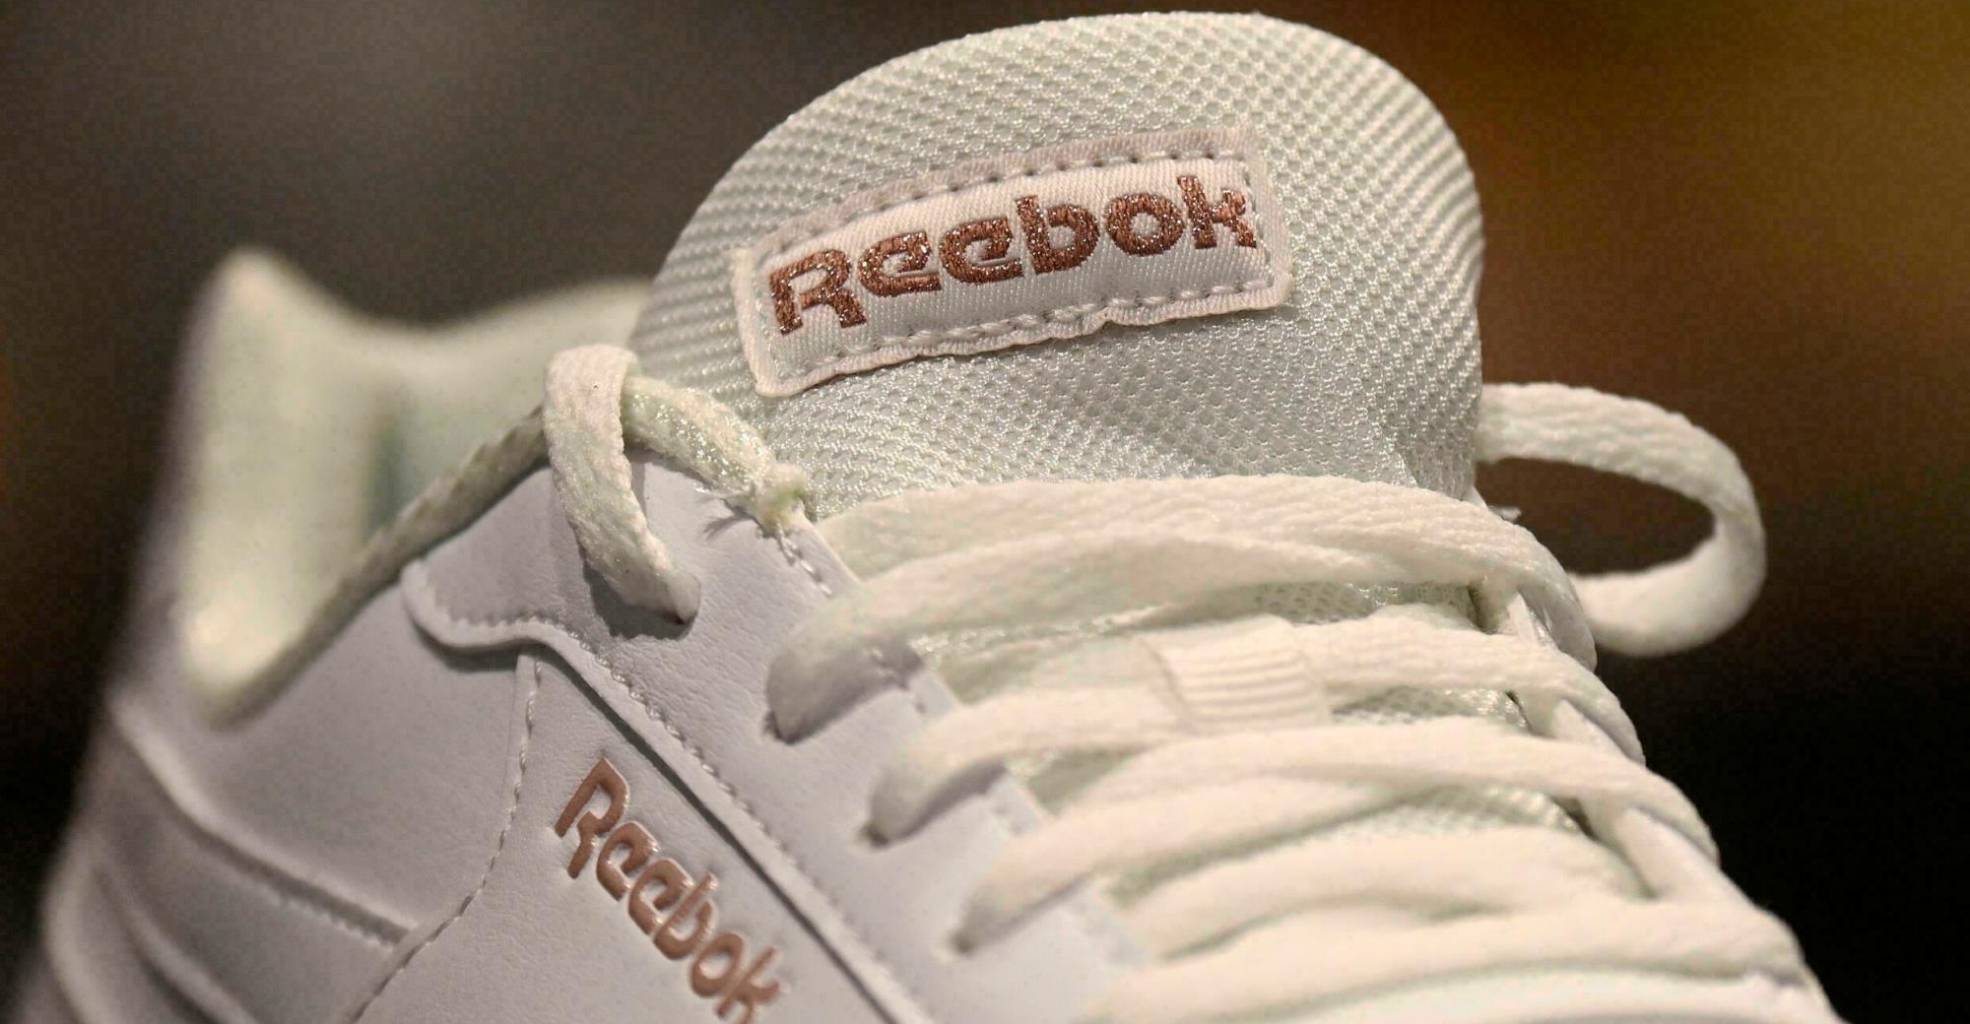 Adidas sells Reebok for $2.5 billion